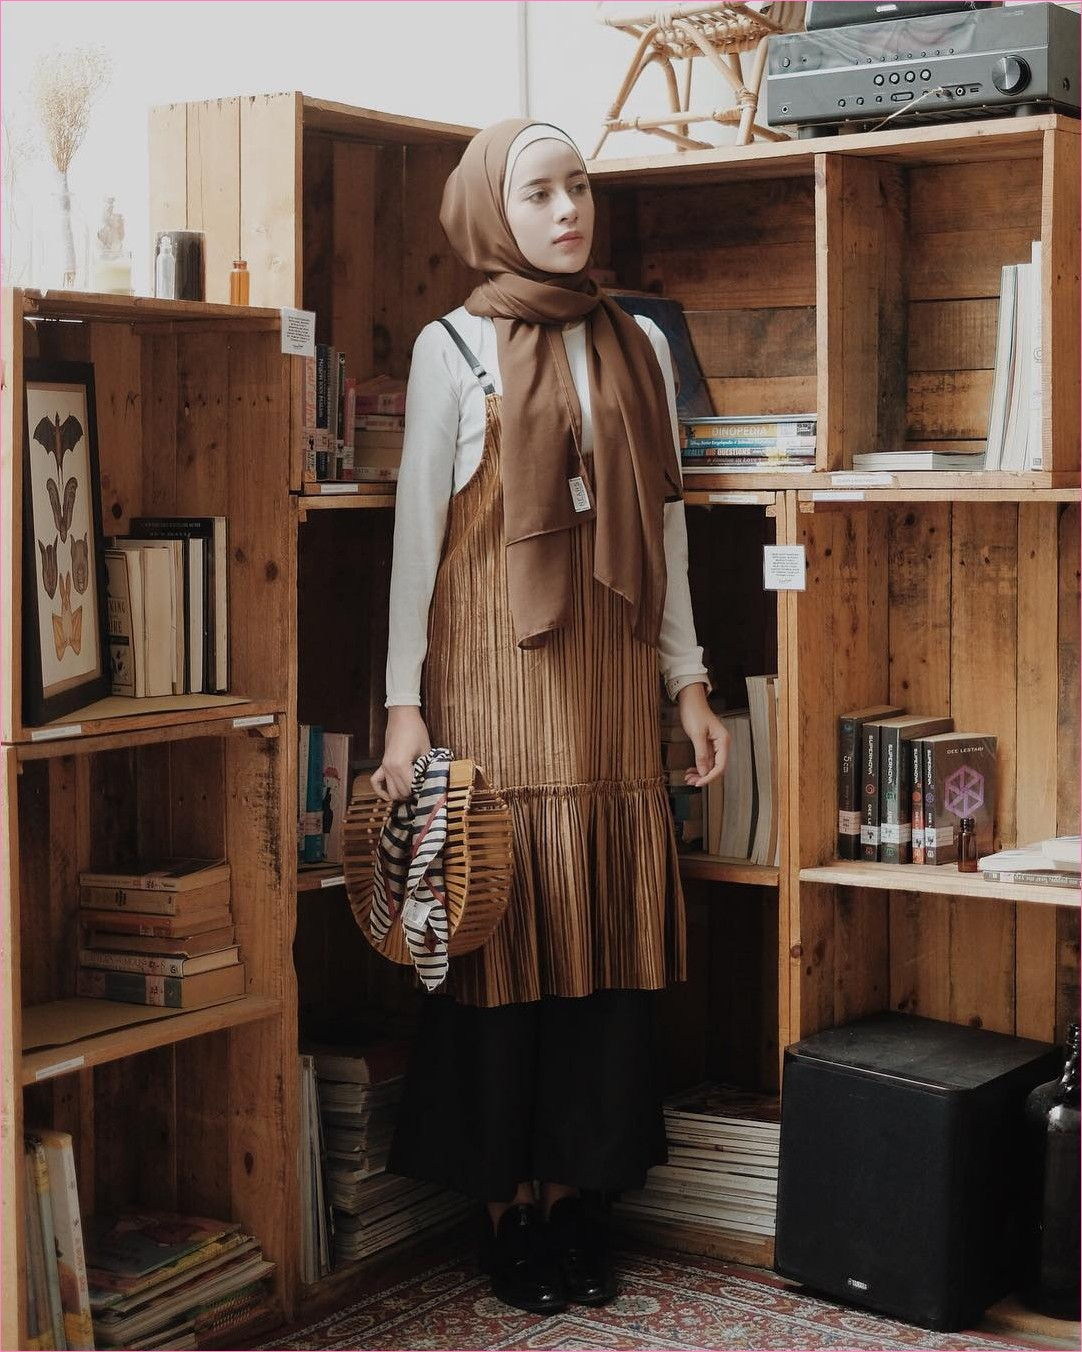 Mix And Match Outfit Baju Luaran (Inner) 2018 Ala Selebgram slip dress coklat mangset kemeja putih handbags rotan kayu scraf stripes ankle boots hitam celana cullotes pallazo abu tua hijab pashmina diamond coklat tua ciput rajut